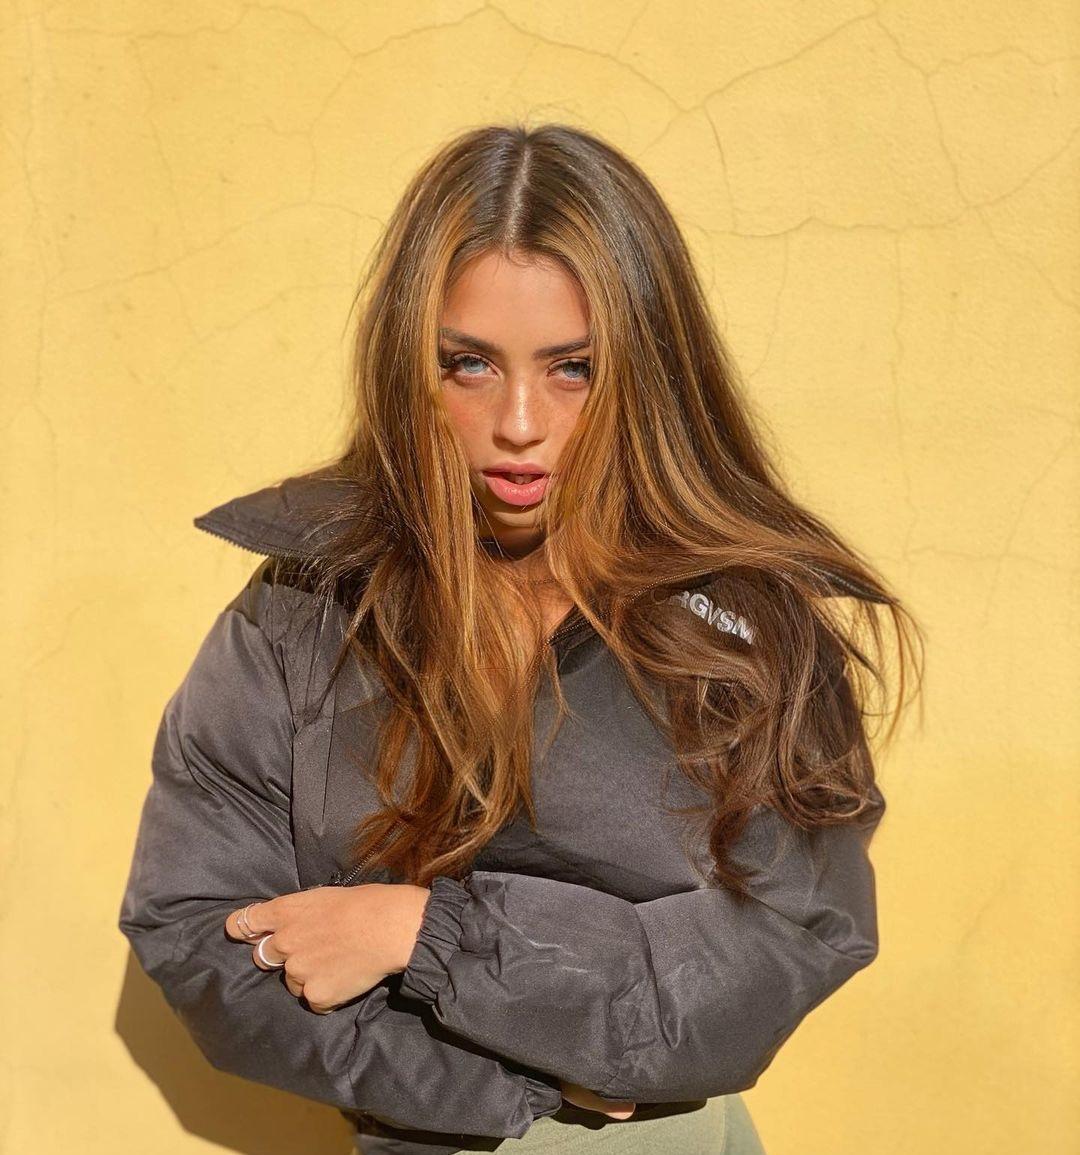 Christina-Bertevello-Wallpapers-Insta-Fit-Bio-16